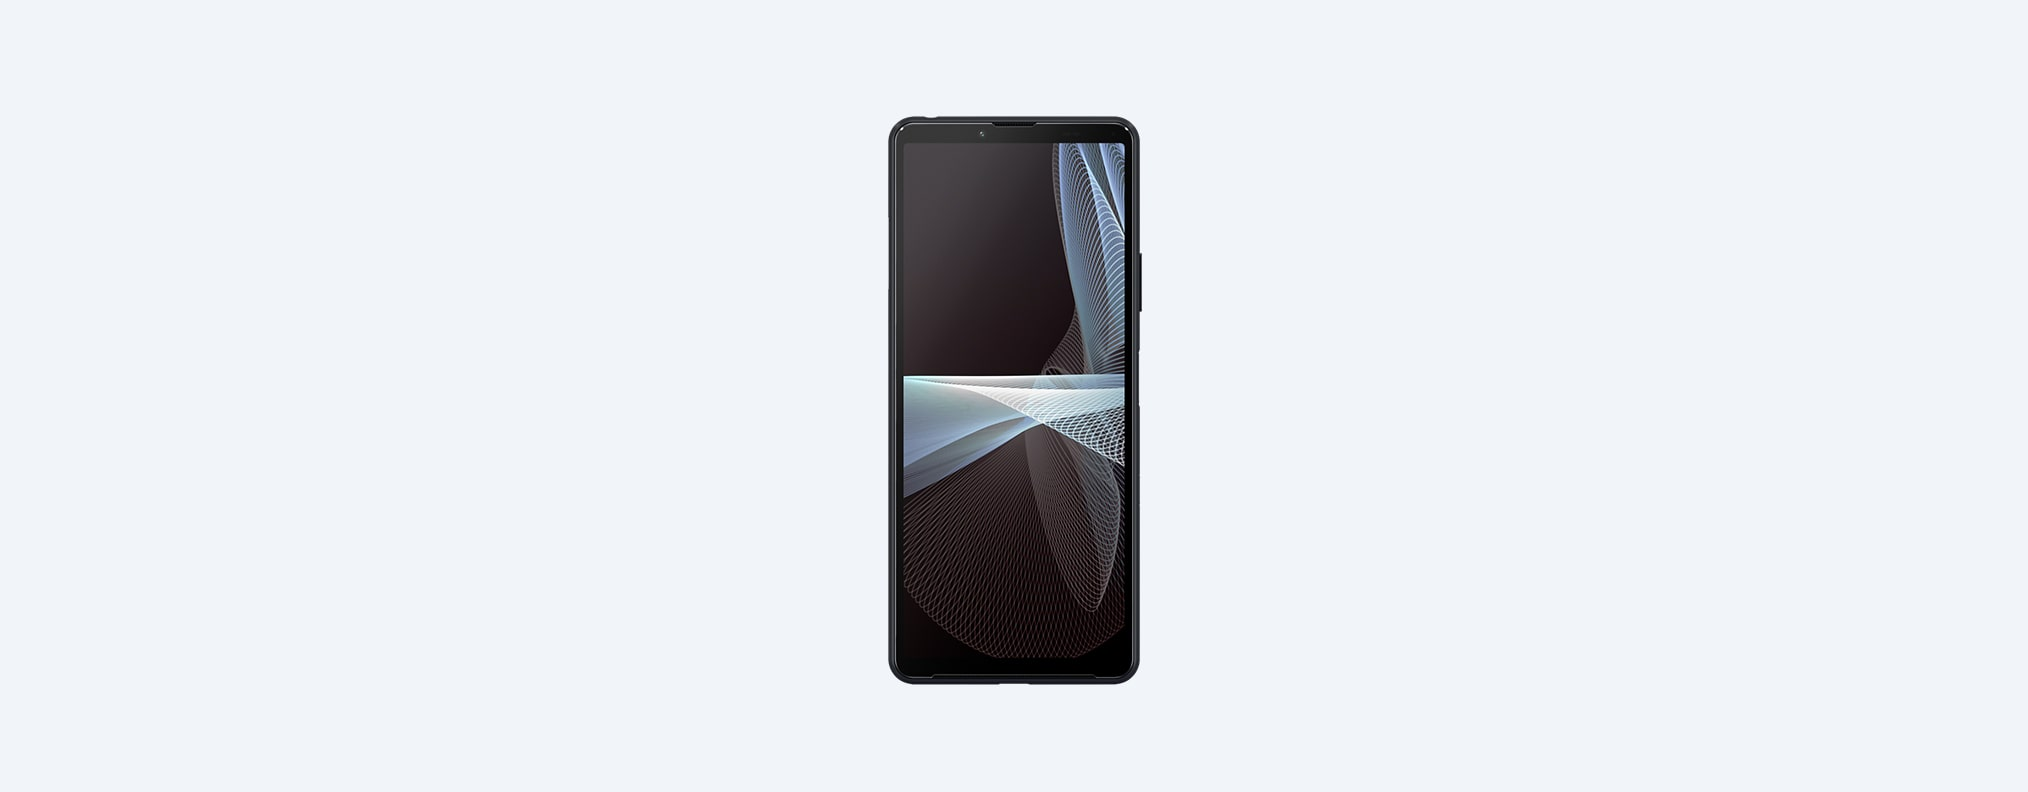 Xperia 10 III Black Color